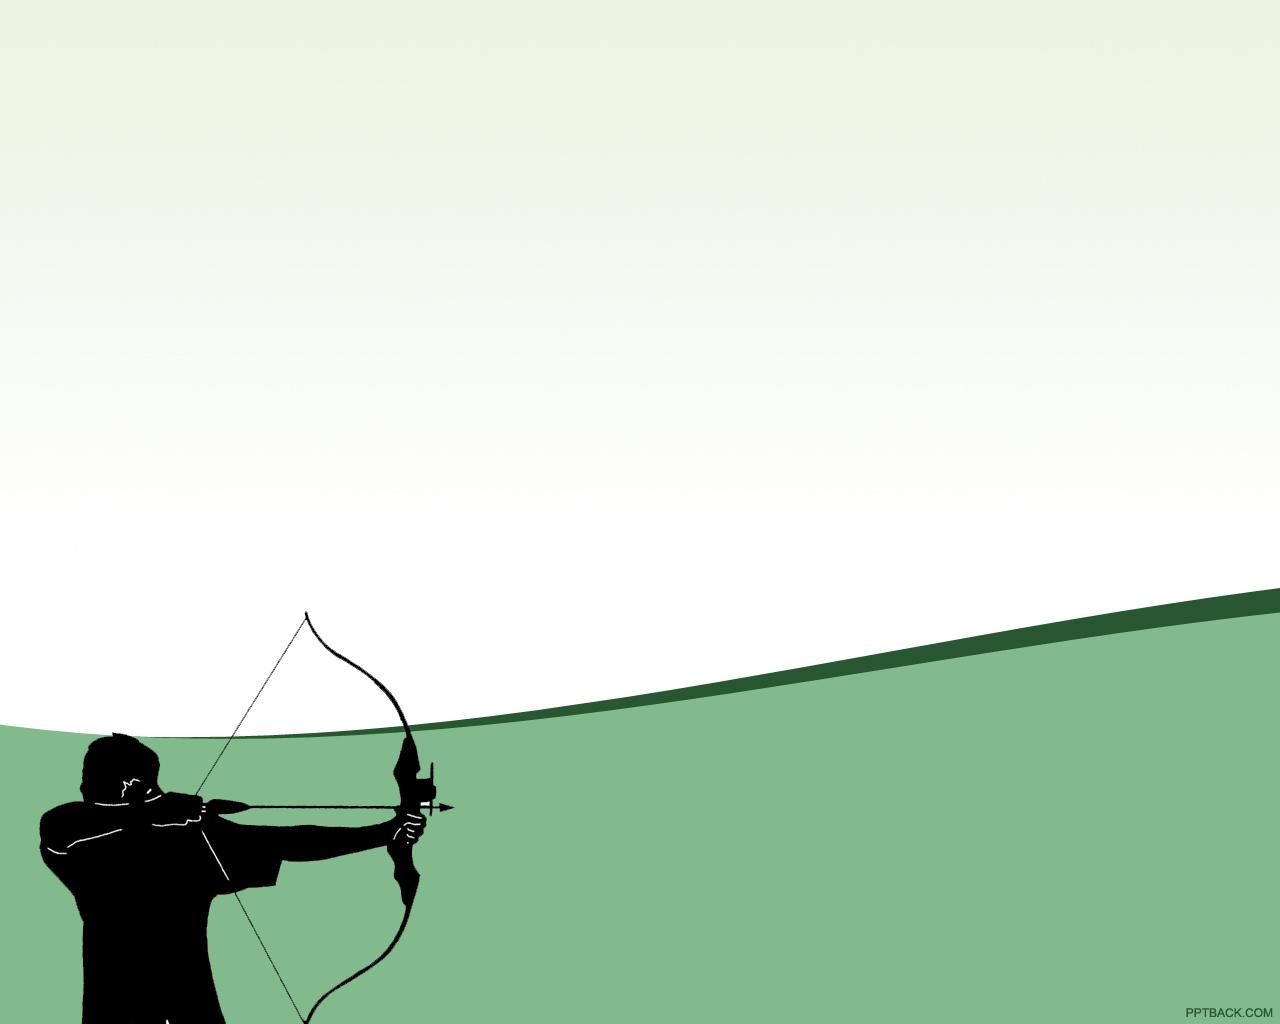 Archery Wallpapers Wallpapersafari HD Wallpapers Download Free Images Wallpaper [1000image.com]